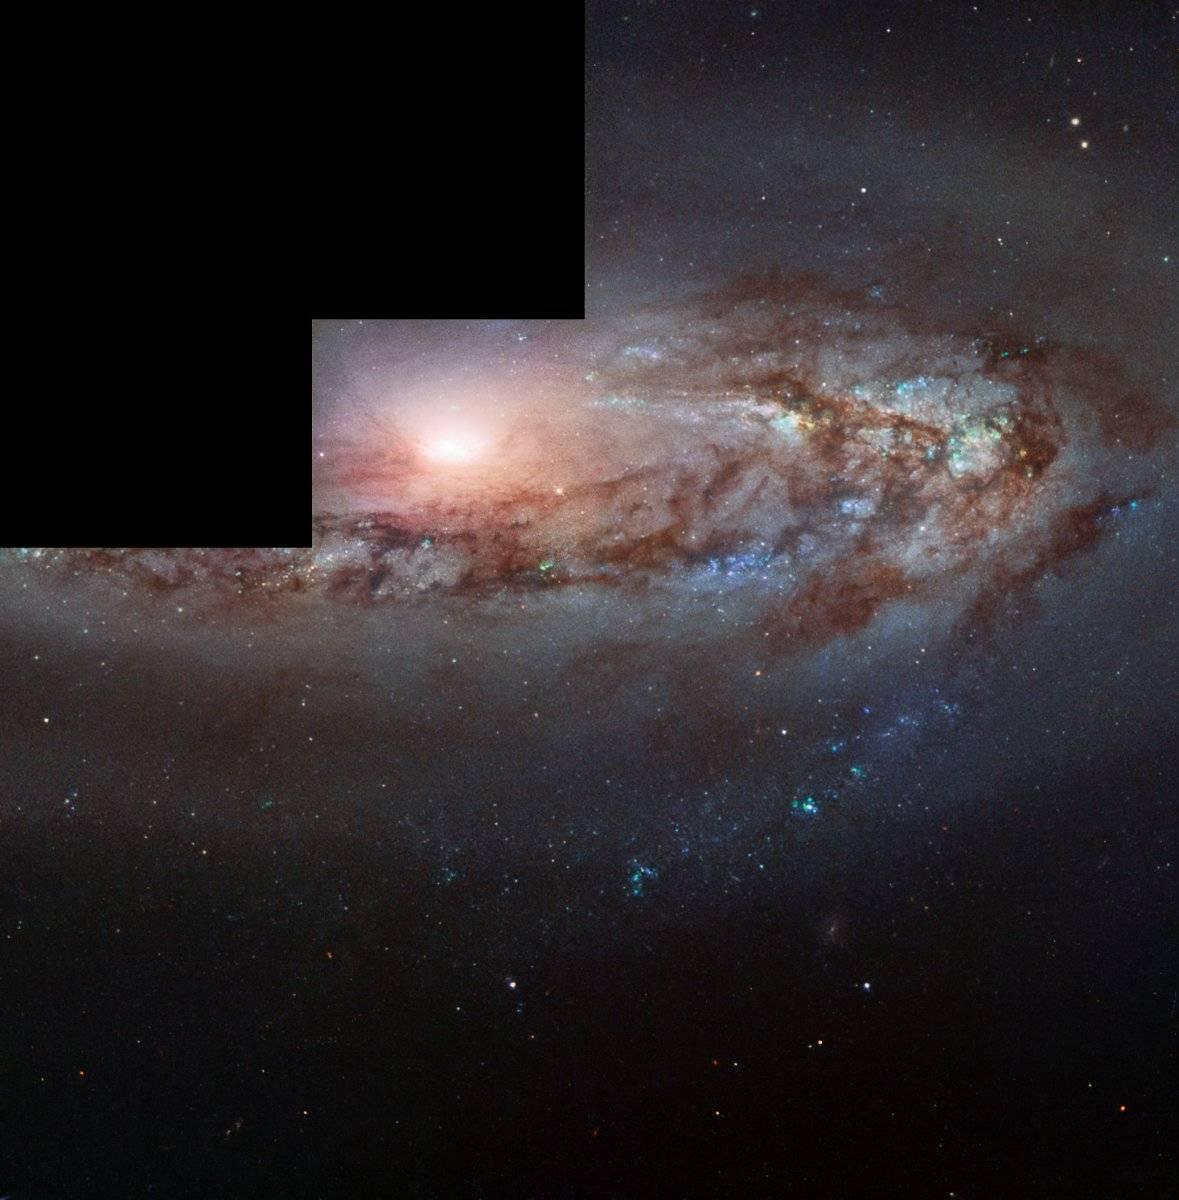 Una extraña galaxia se está acercando inexplicablemente a la Vía Láctea